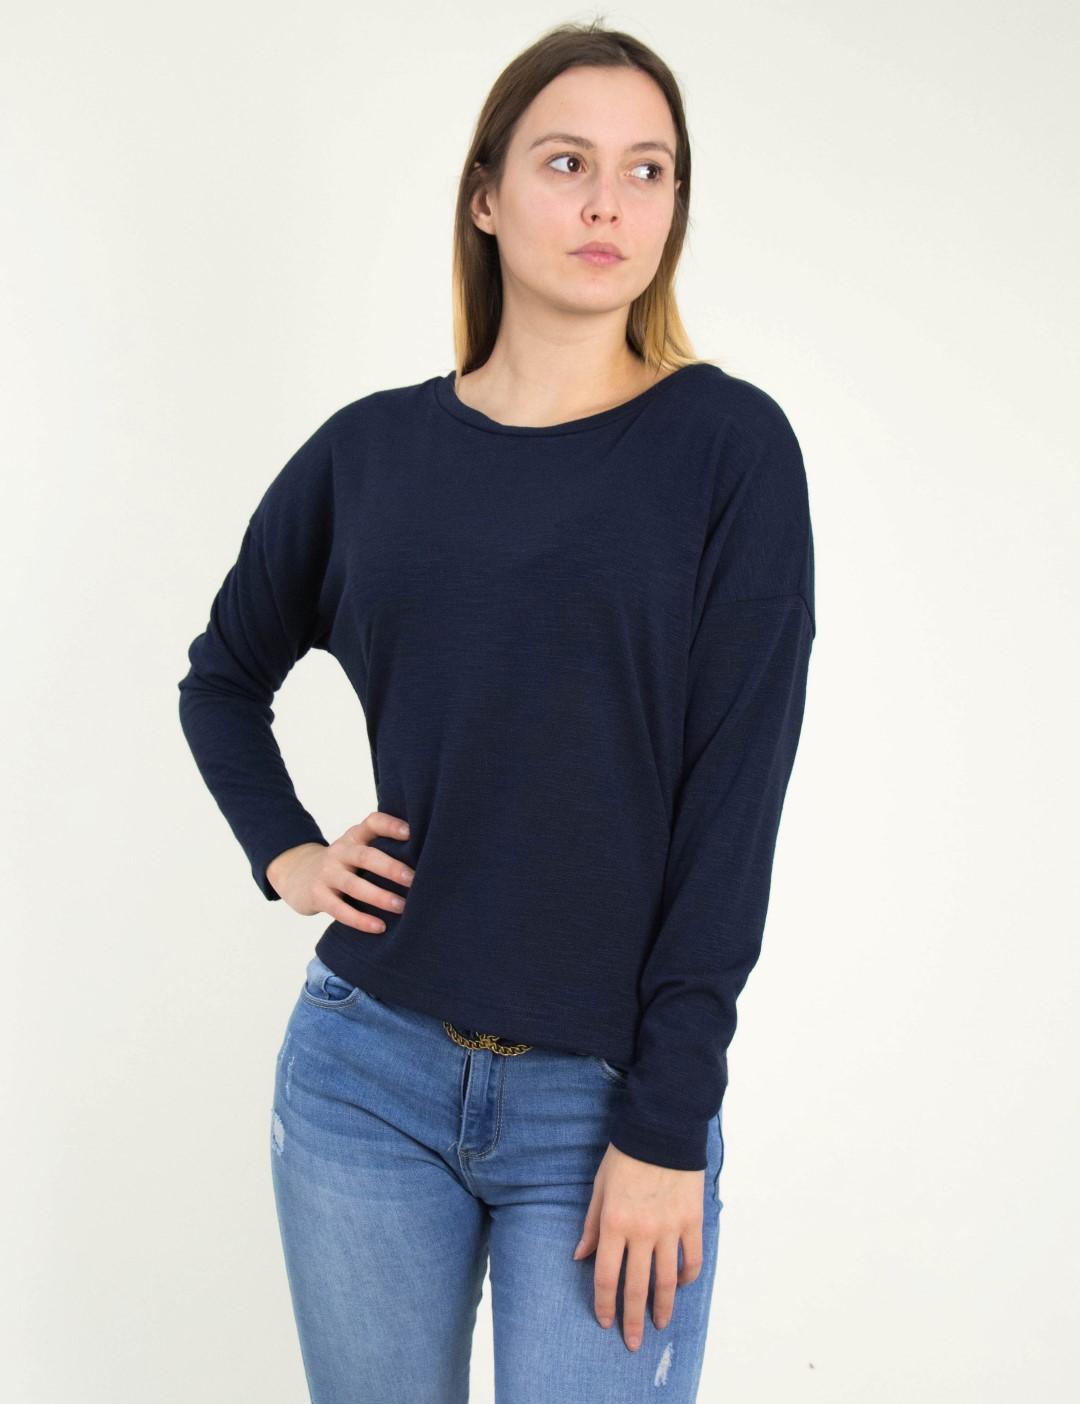 cd1e11236d40 Γυναικεία μπλε μακρυμάνικη μπλούζα κουμπιά Cocktail 014101034